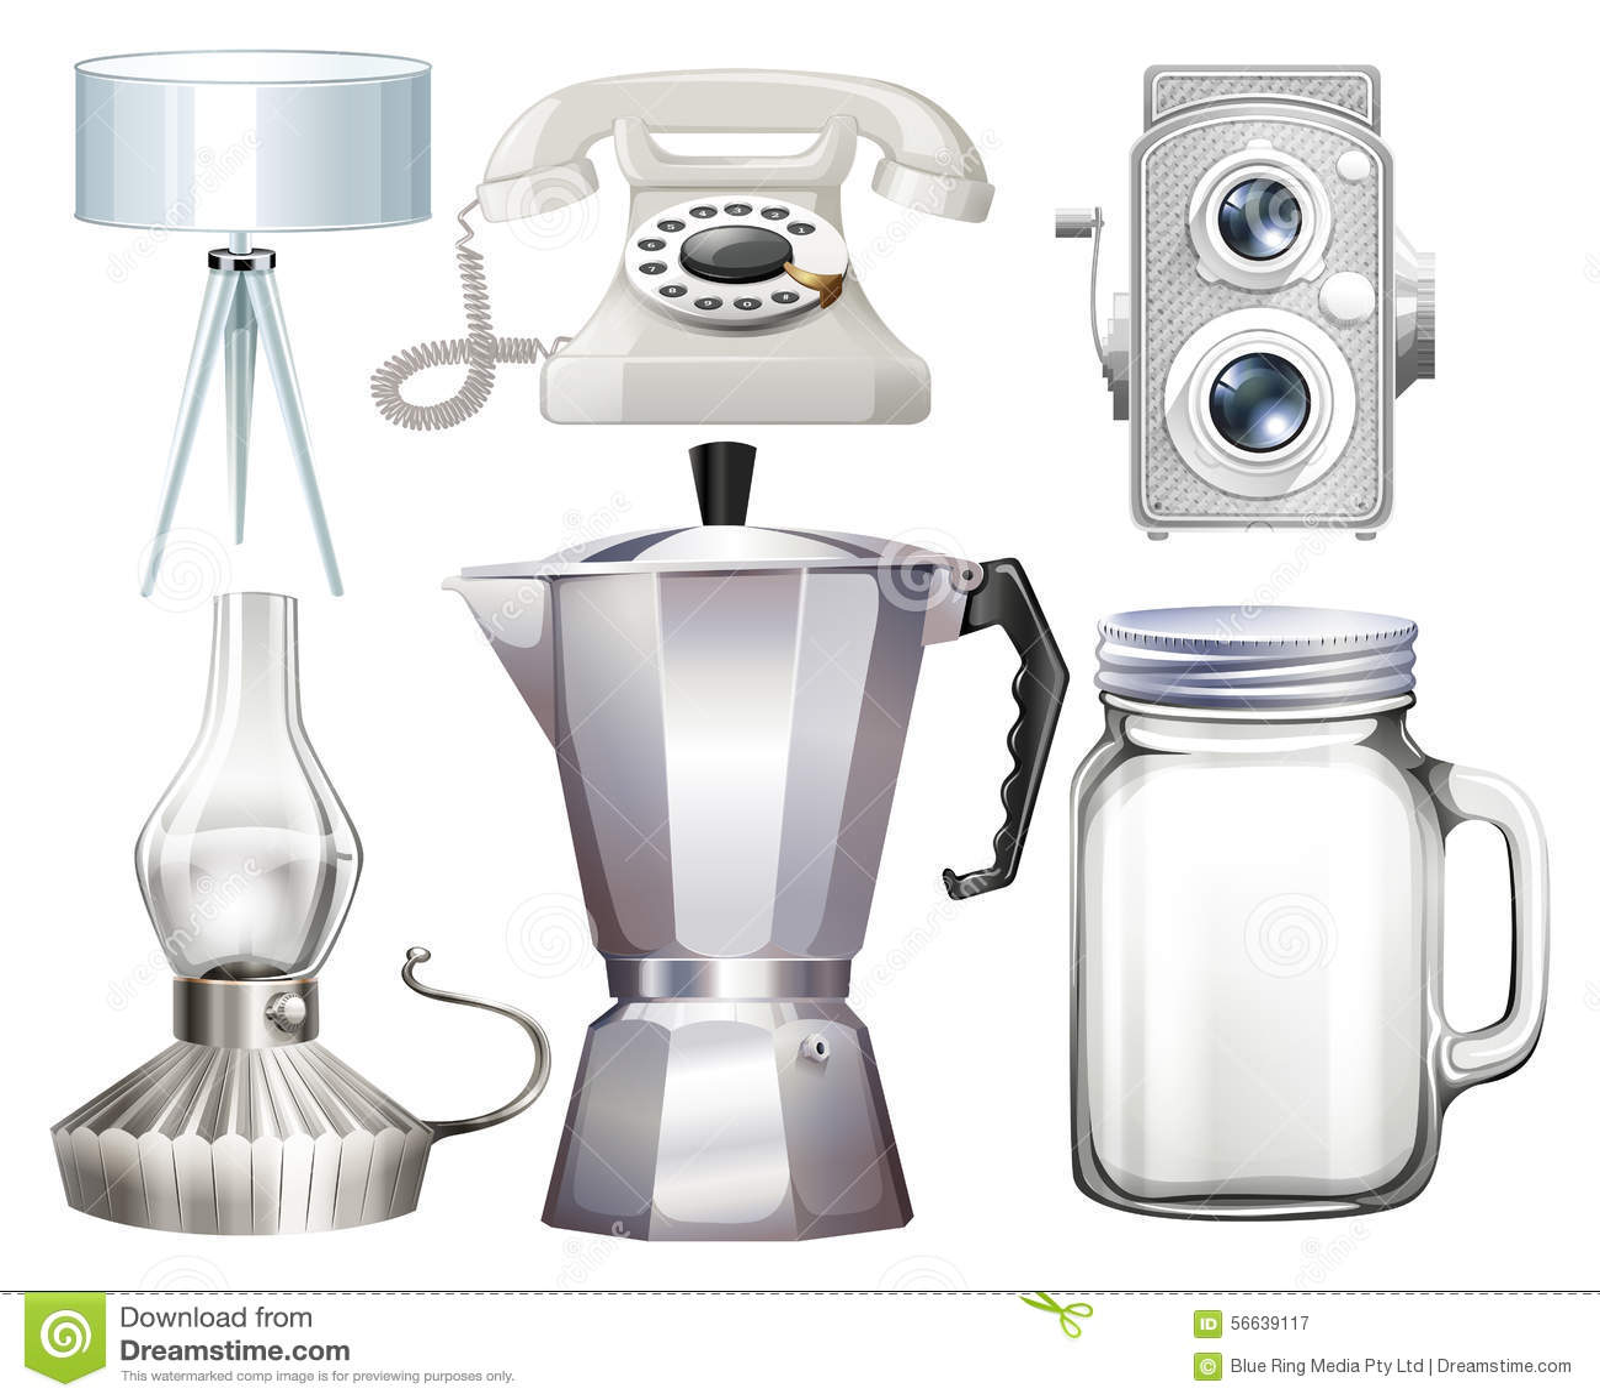 Objetos del hogar ilustraci n del vector imagen 56639117 for Objetos para el hogar